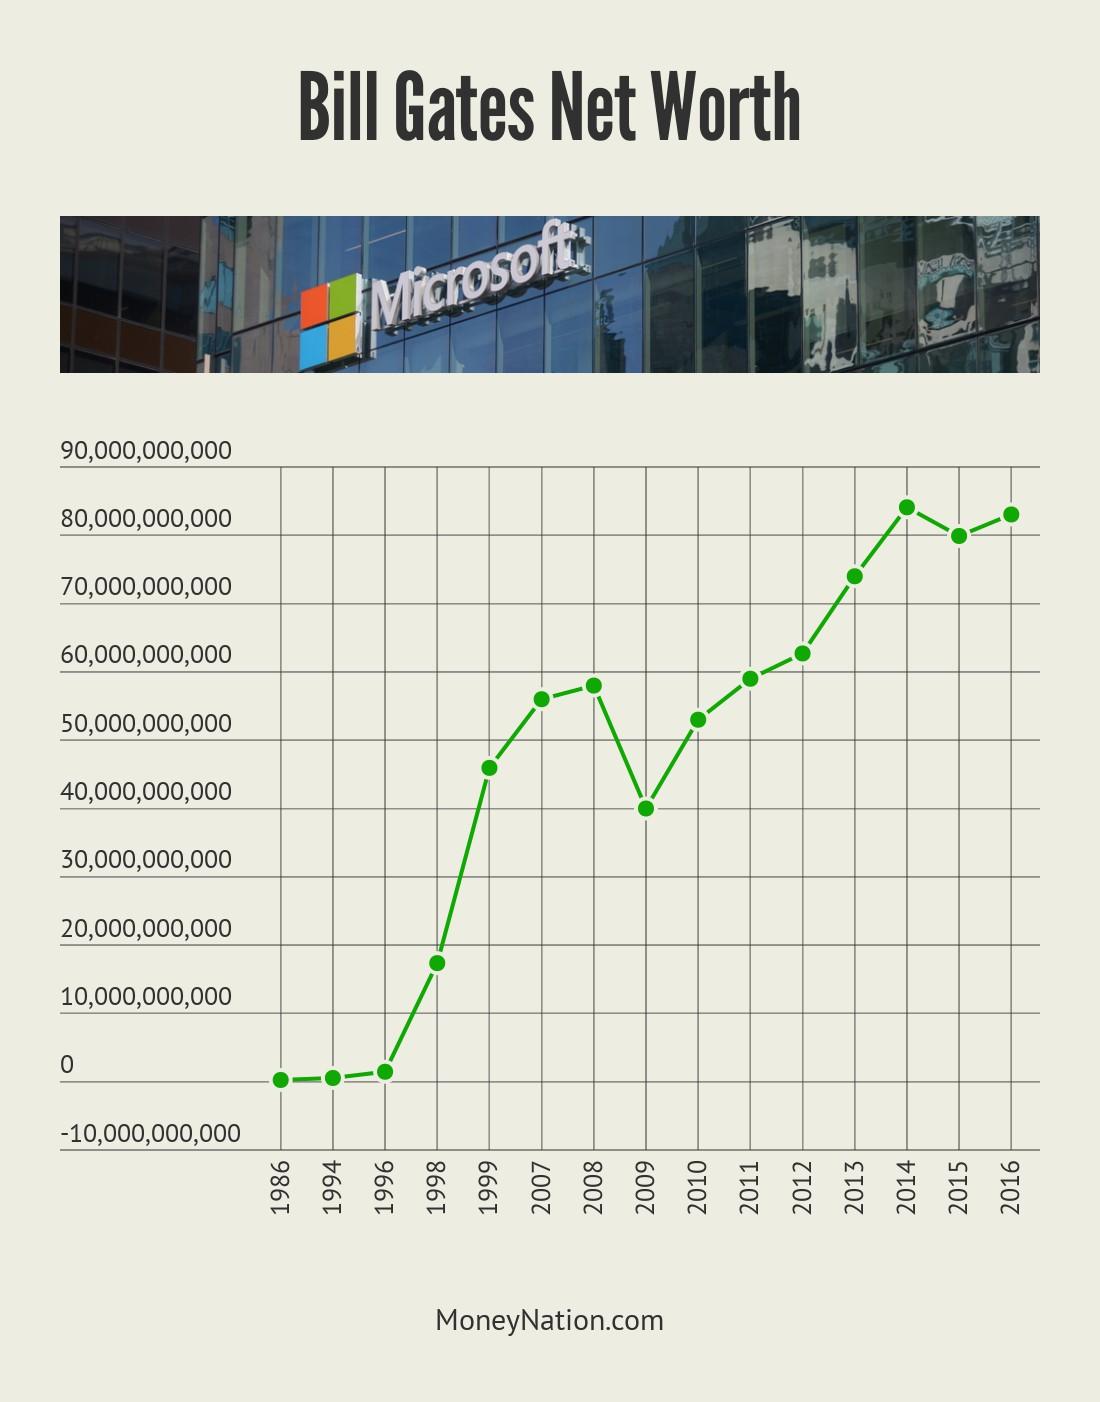 Bill Gates Net Worth Timeline